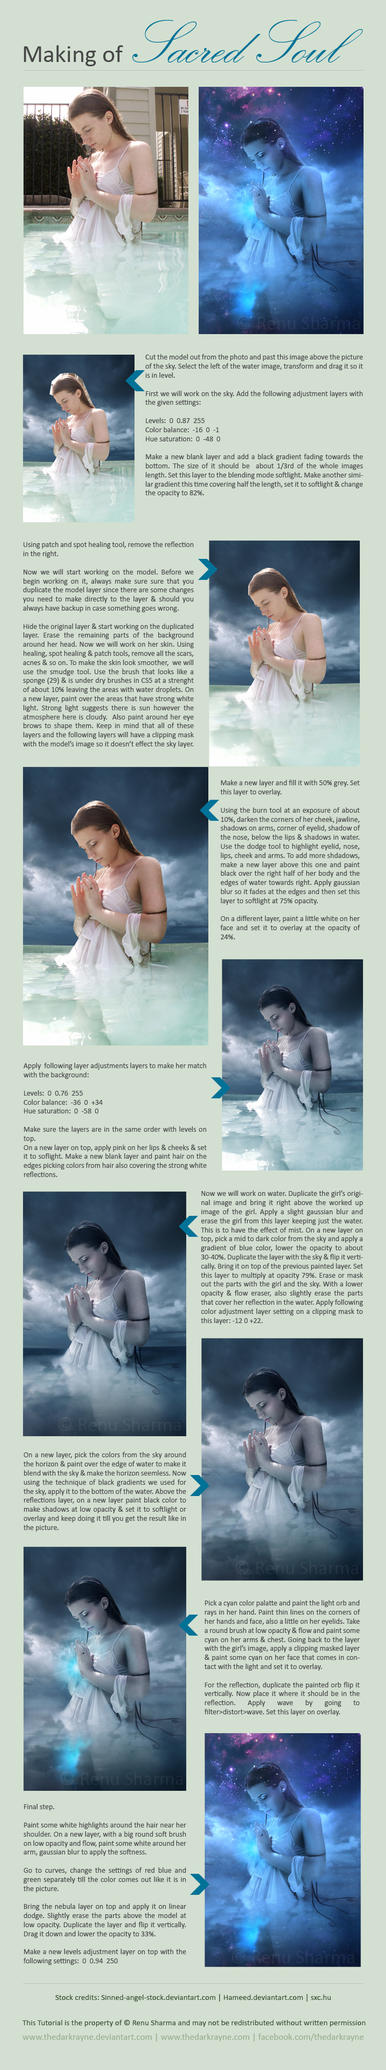 Sacred Soul - Tutorial by TheDarkRayne